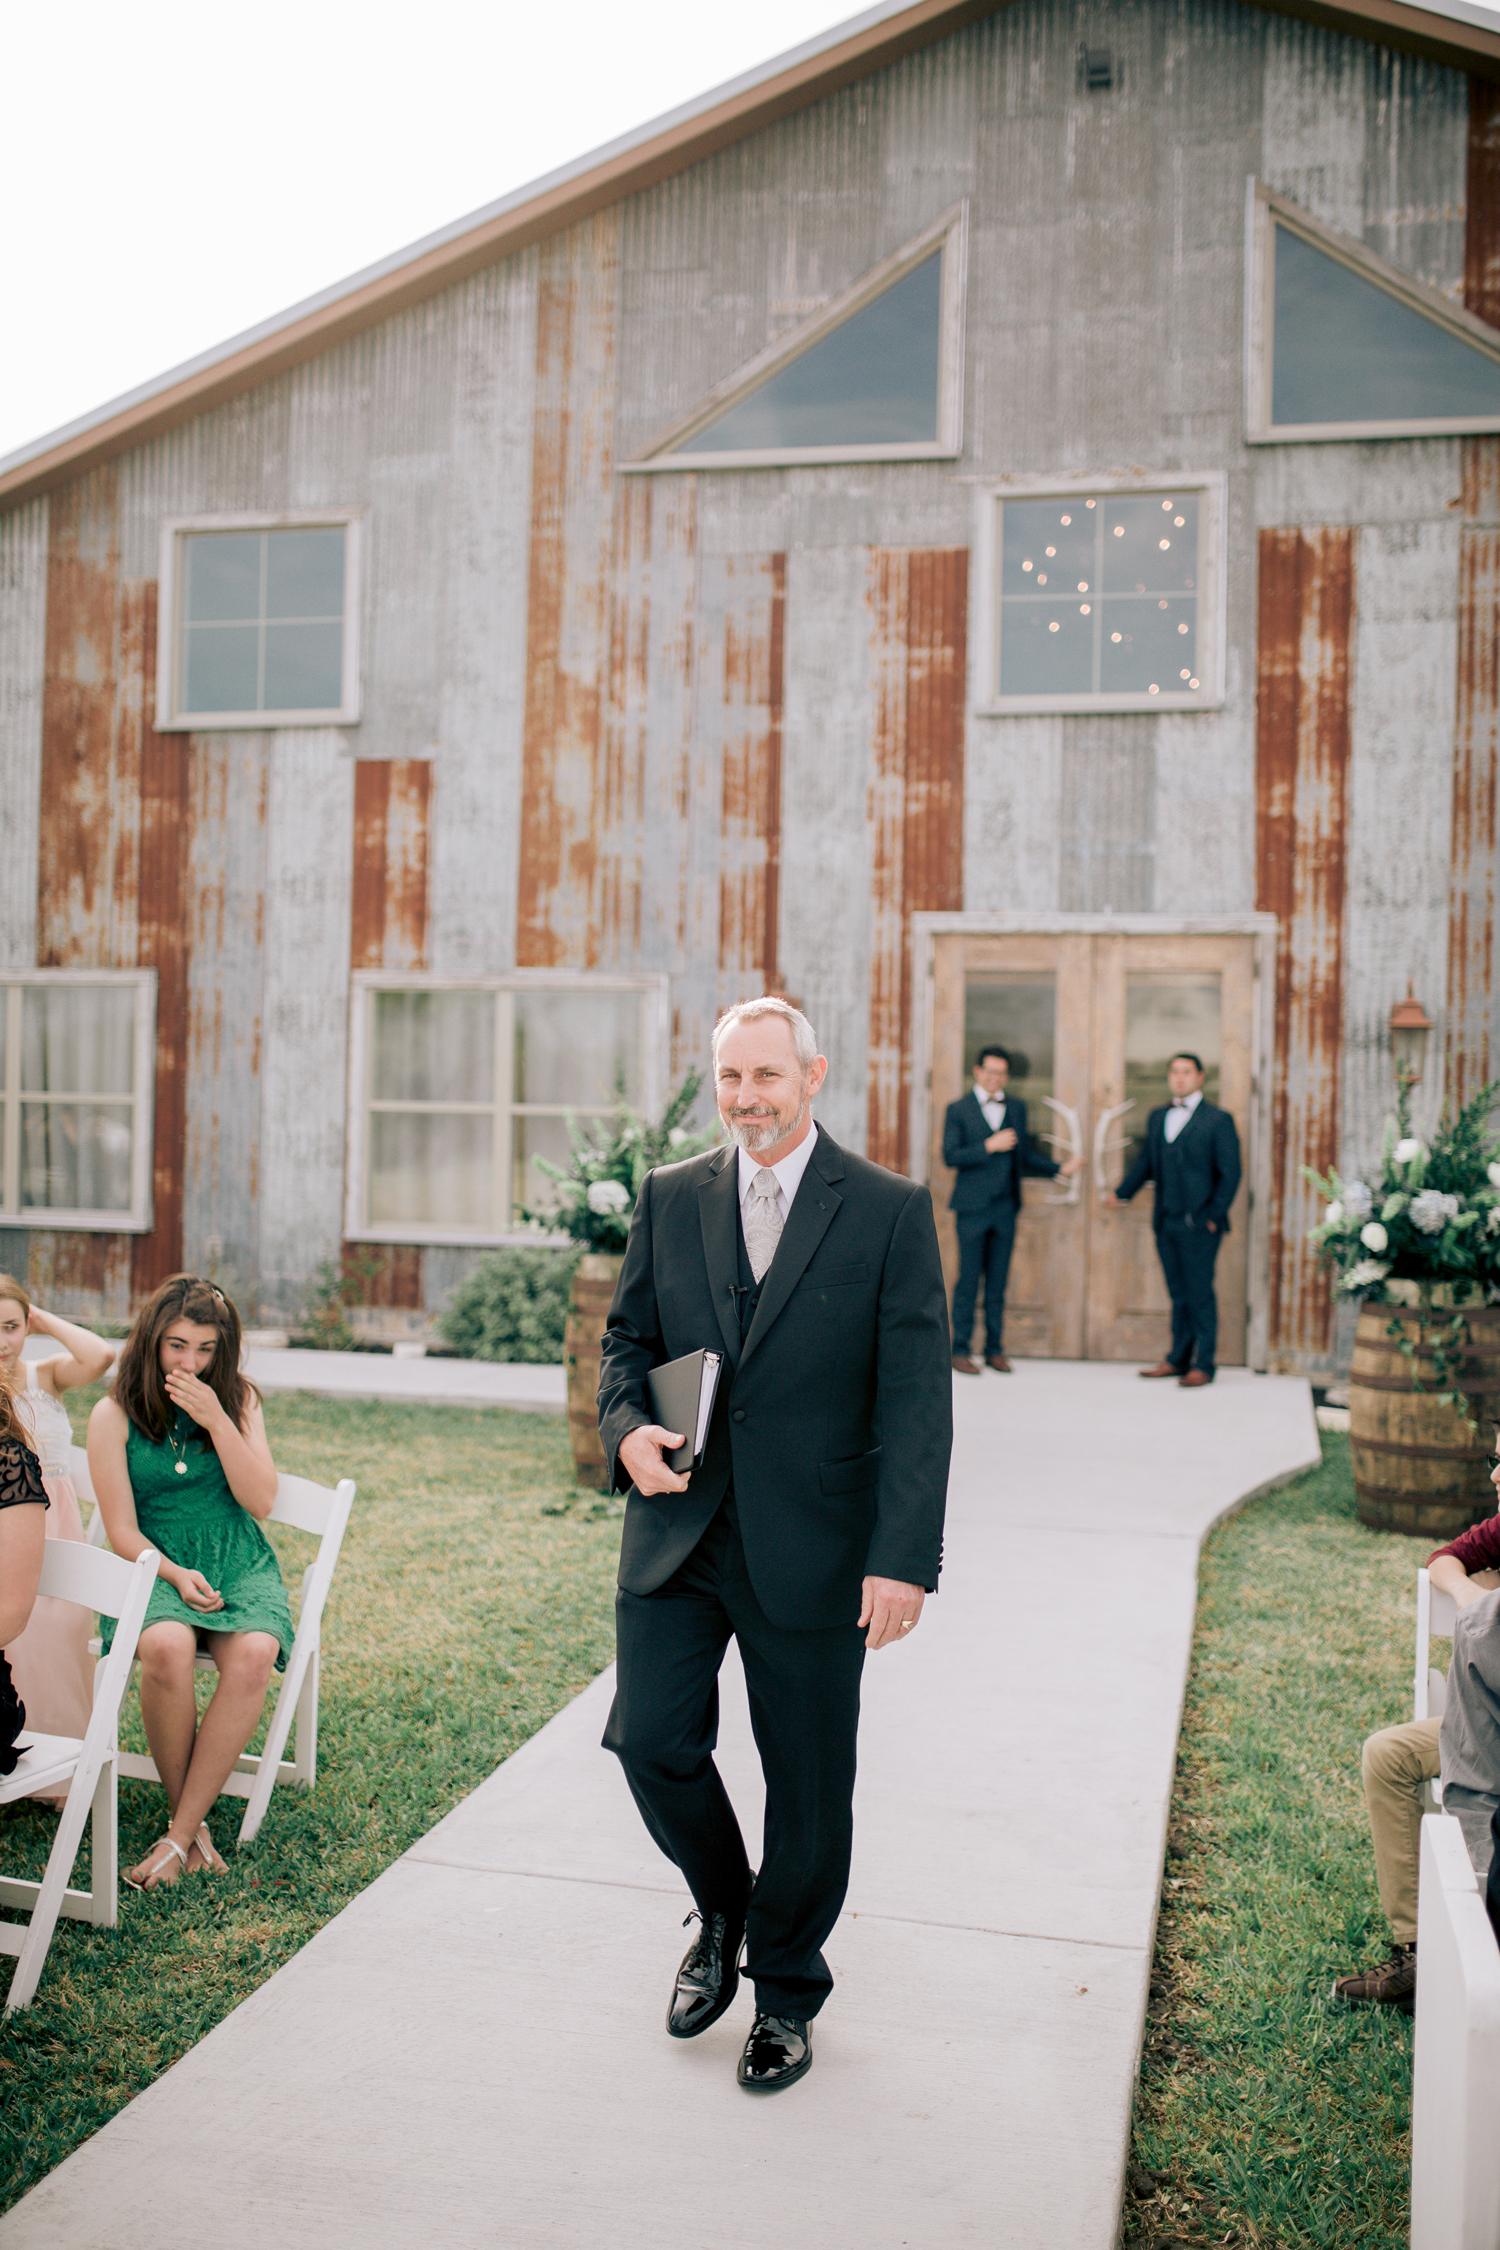 alaa-marzouk-photography-rgvweddingphotographer-rio-grande-valley-mathis-wedding-bridal-bride-san-antonio-portrait-weddings-mcallen-88.jpg